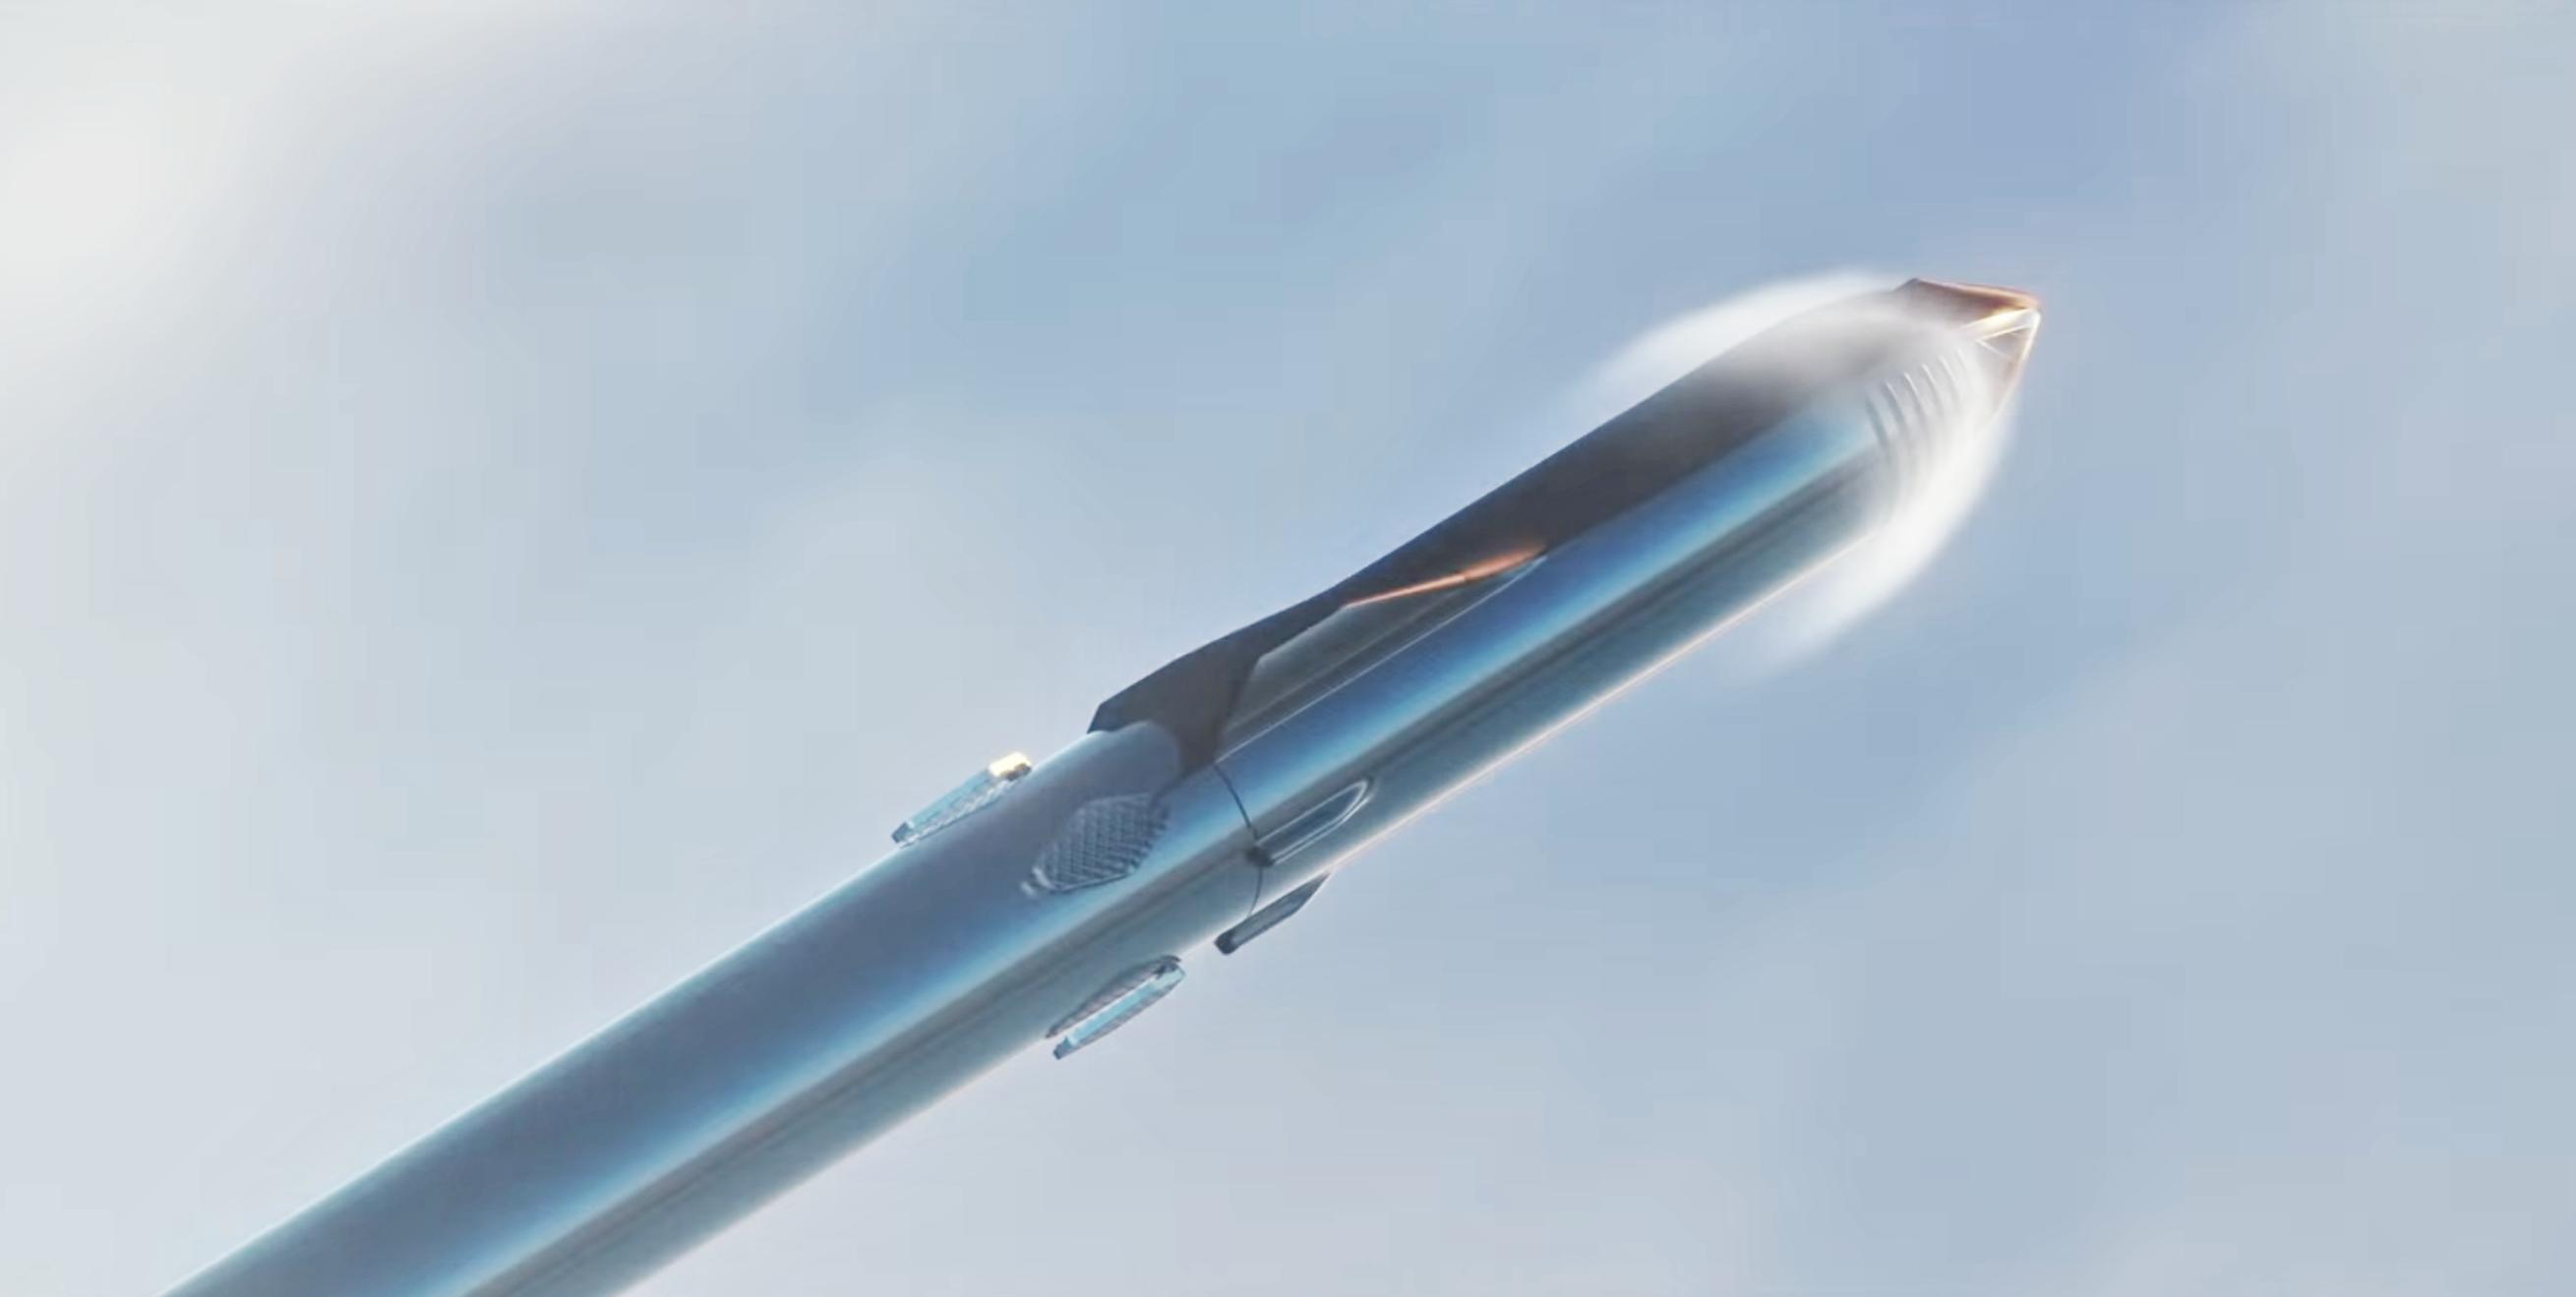 Starship Super Heavy 2019 (SpaceX) Max Q 2 crop